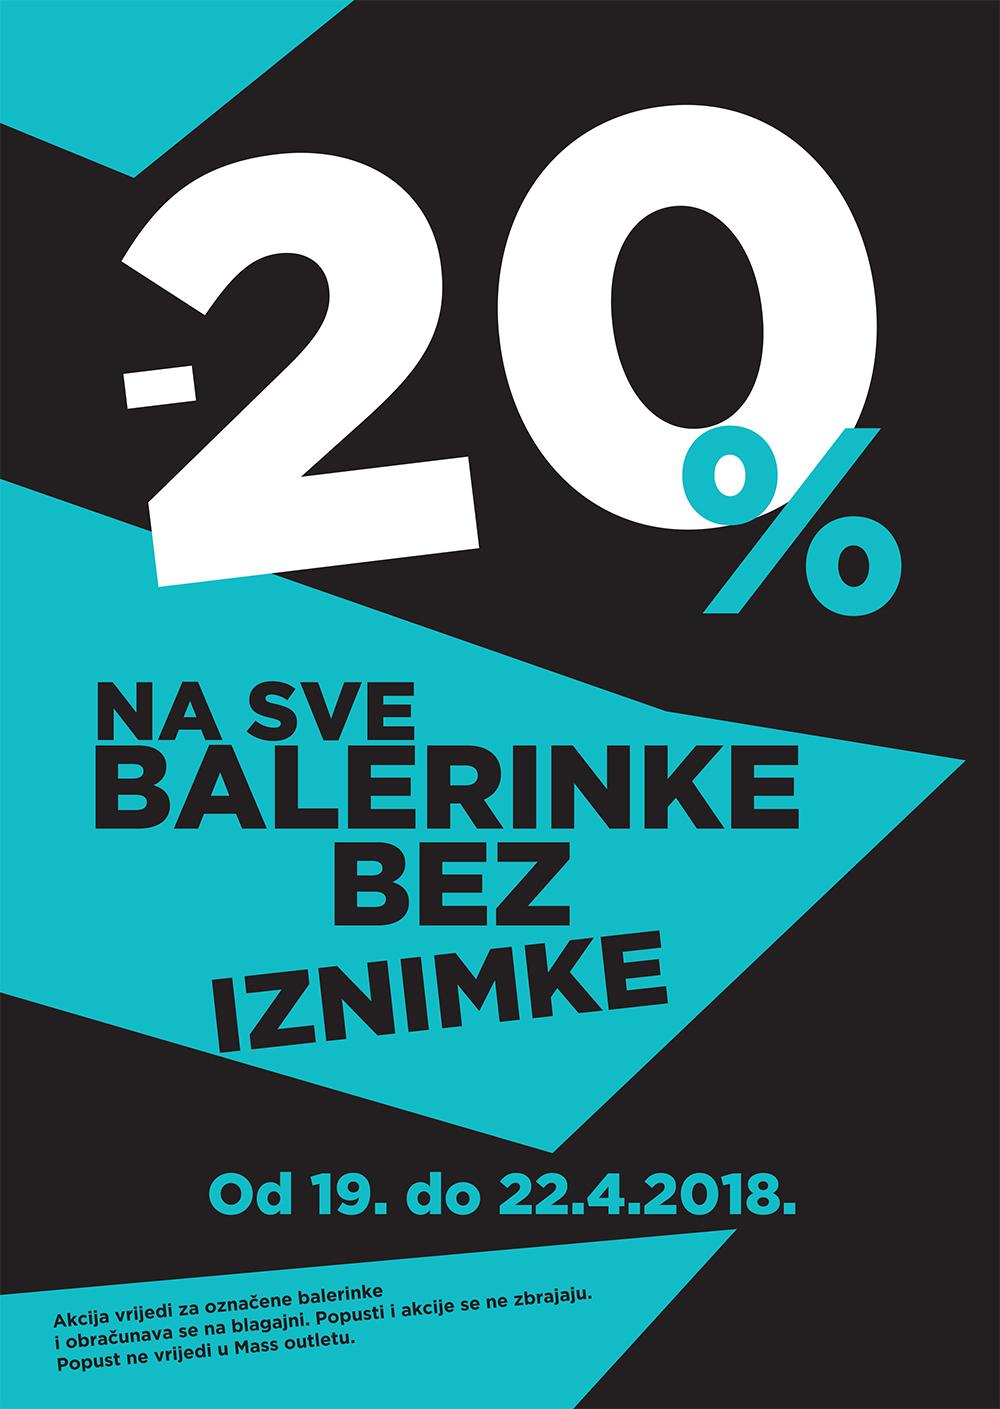 HR_20Posto Balerinke_A4_FIN